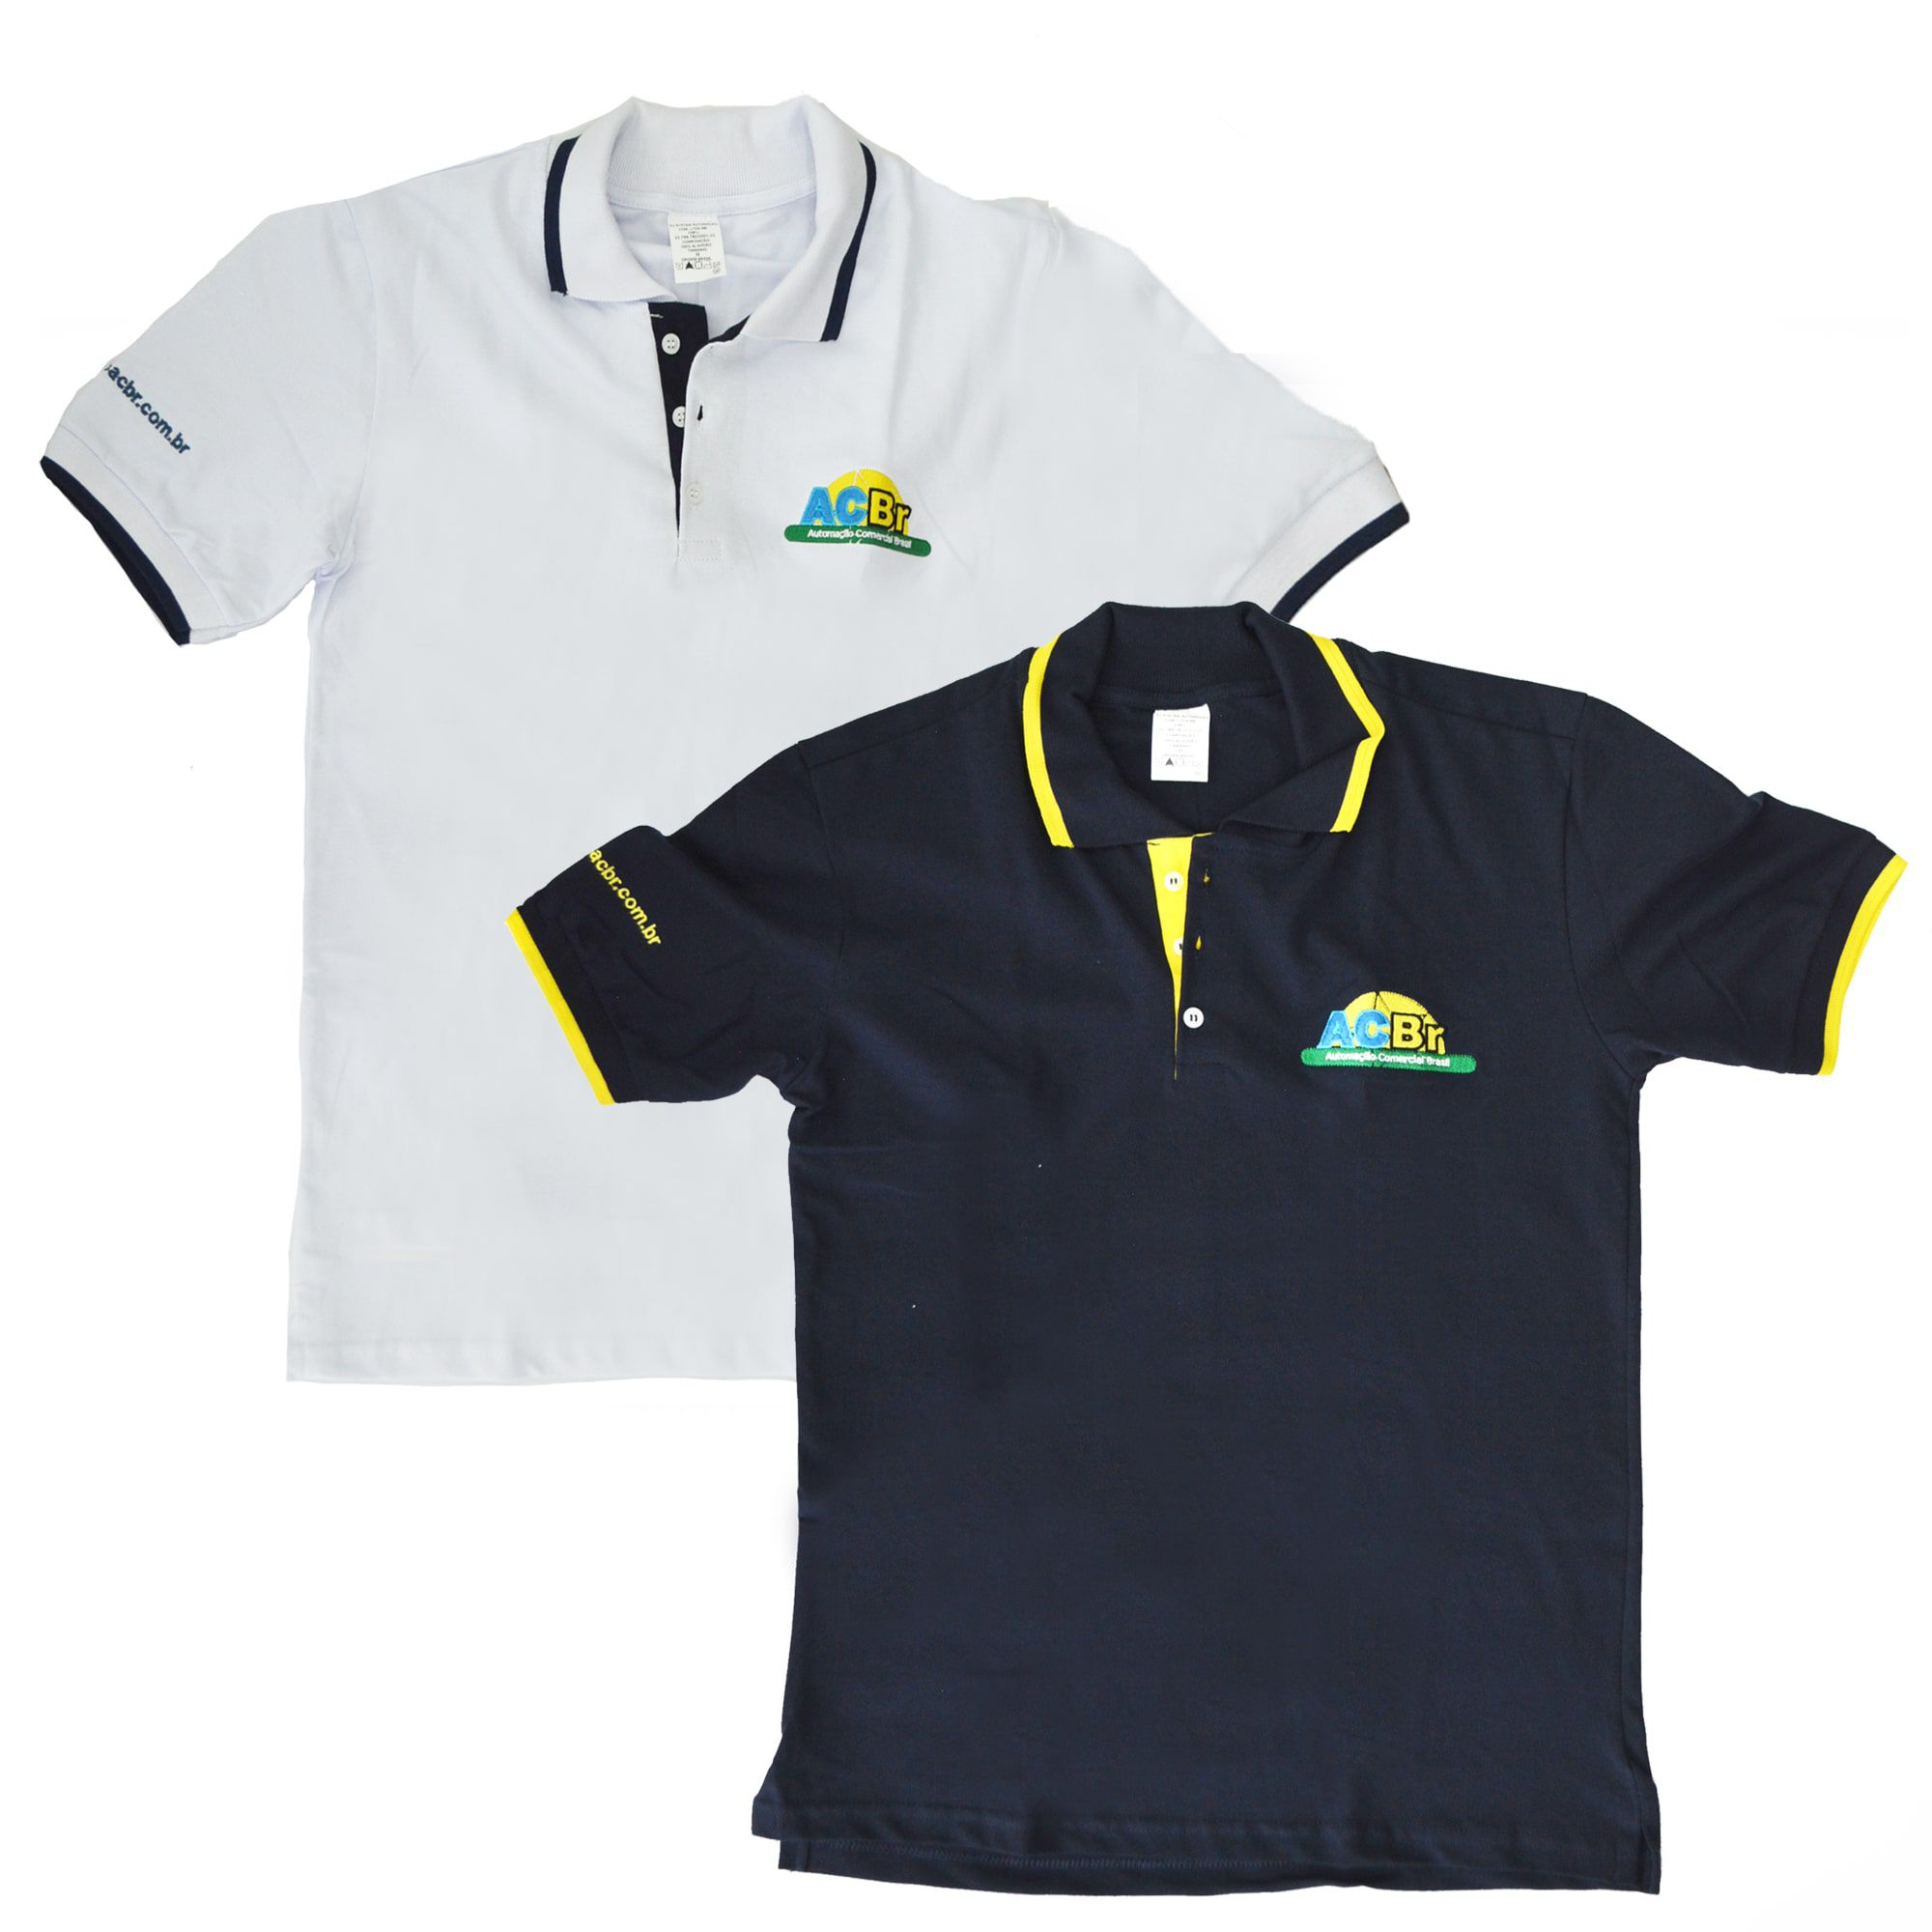 Camisa Polo Projeto ACBr